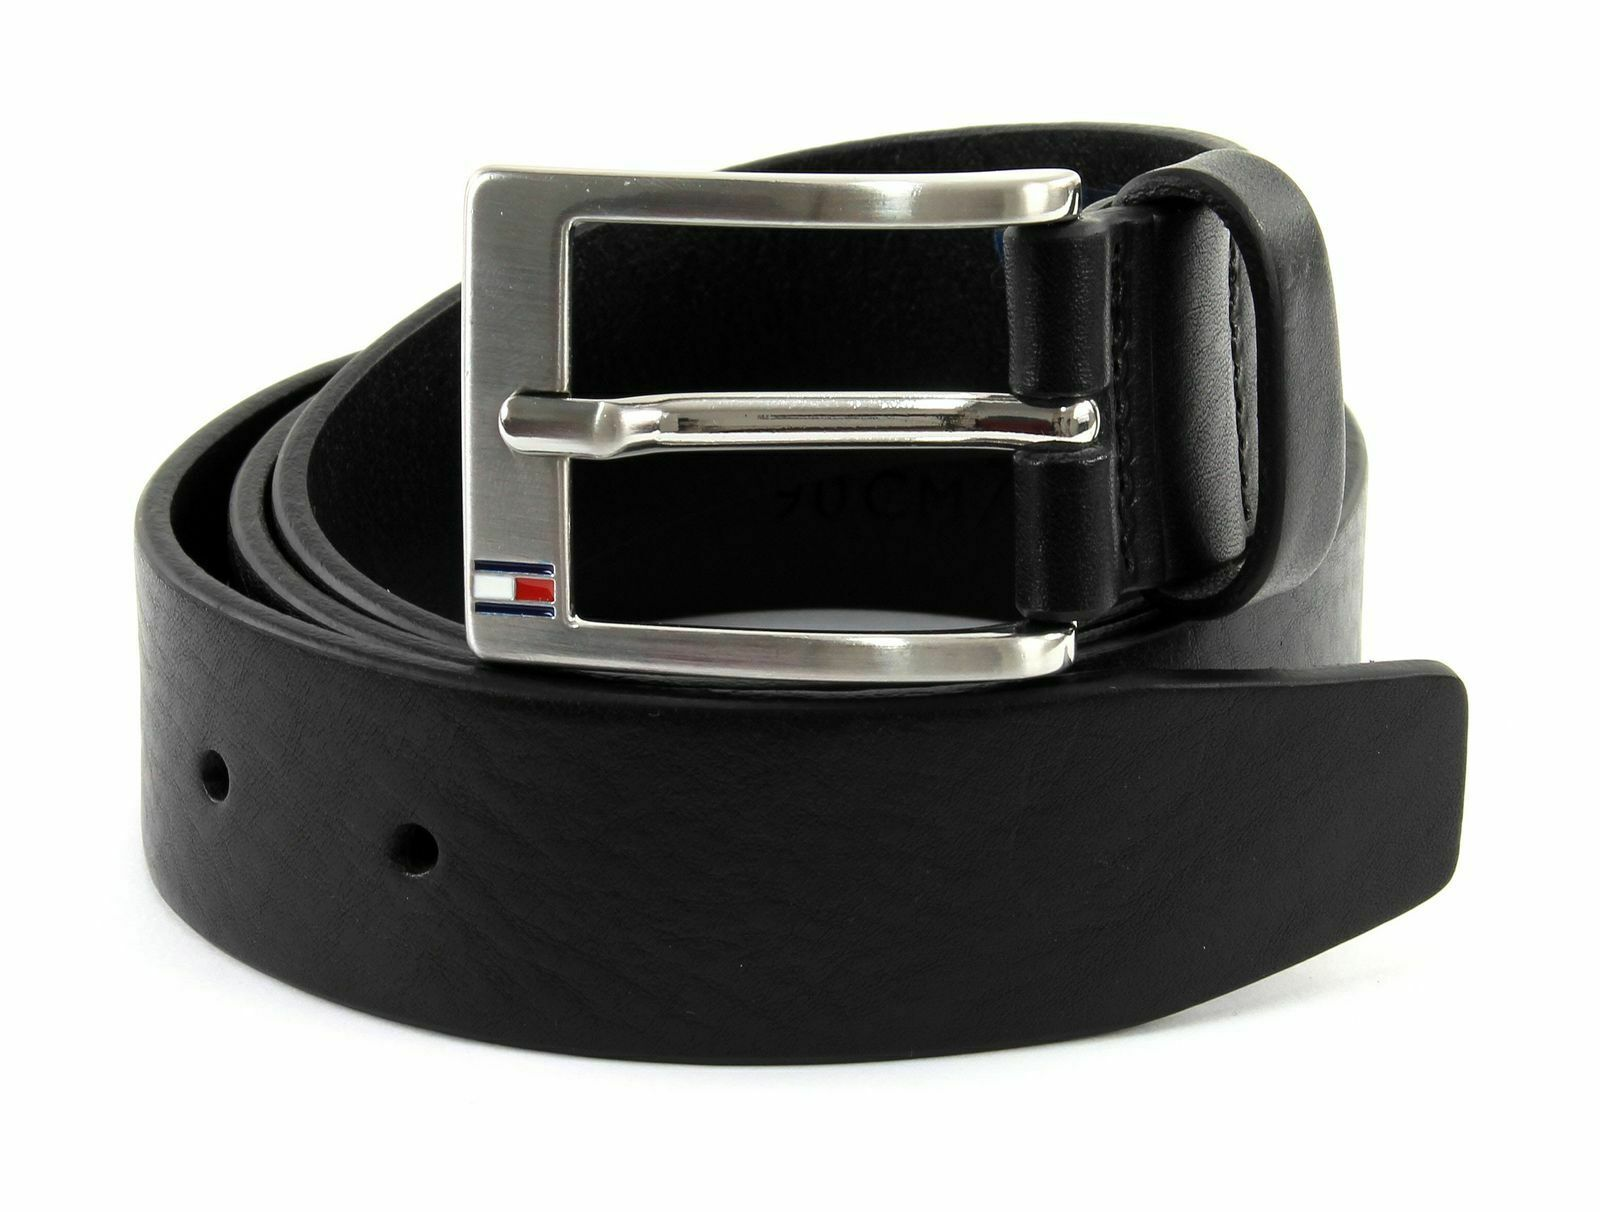 TOMMY HILFIGER New Denton Belt 3.5 W110 Gürtel Accessoire Dark Tan Braun Neu